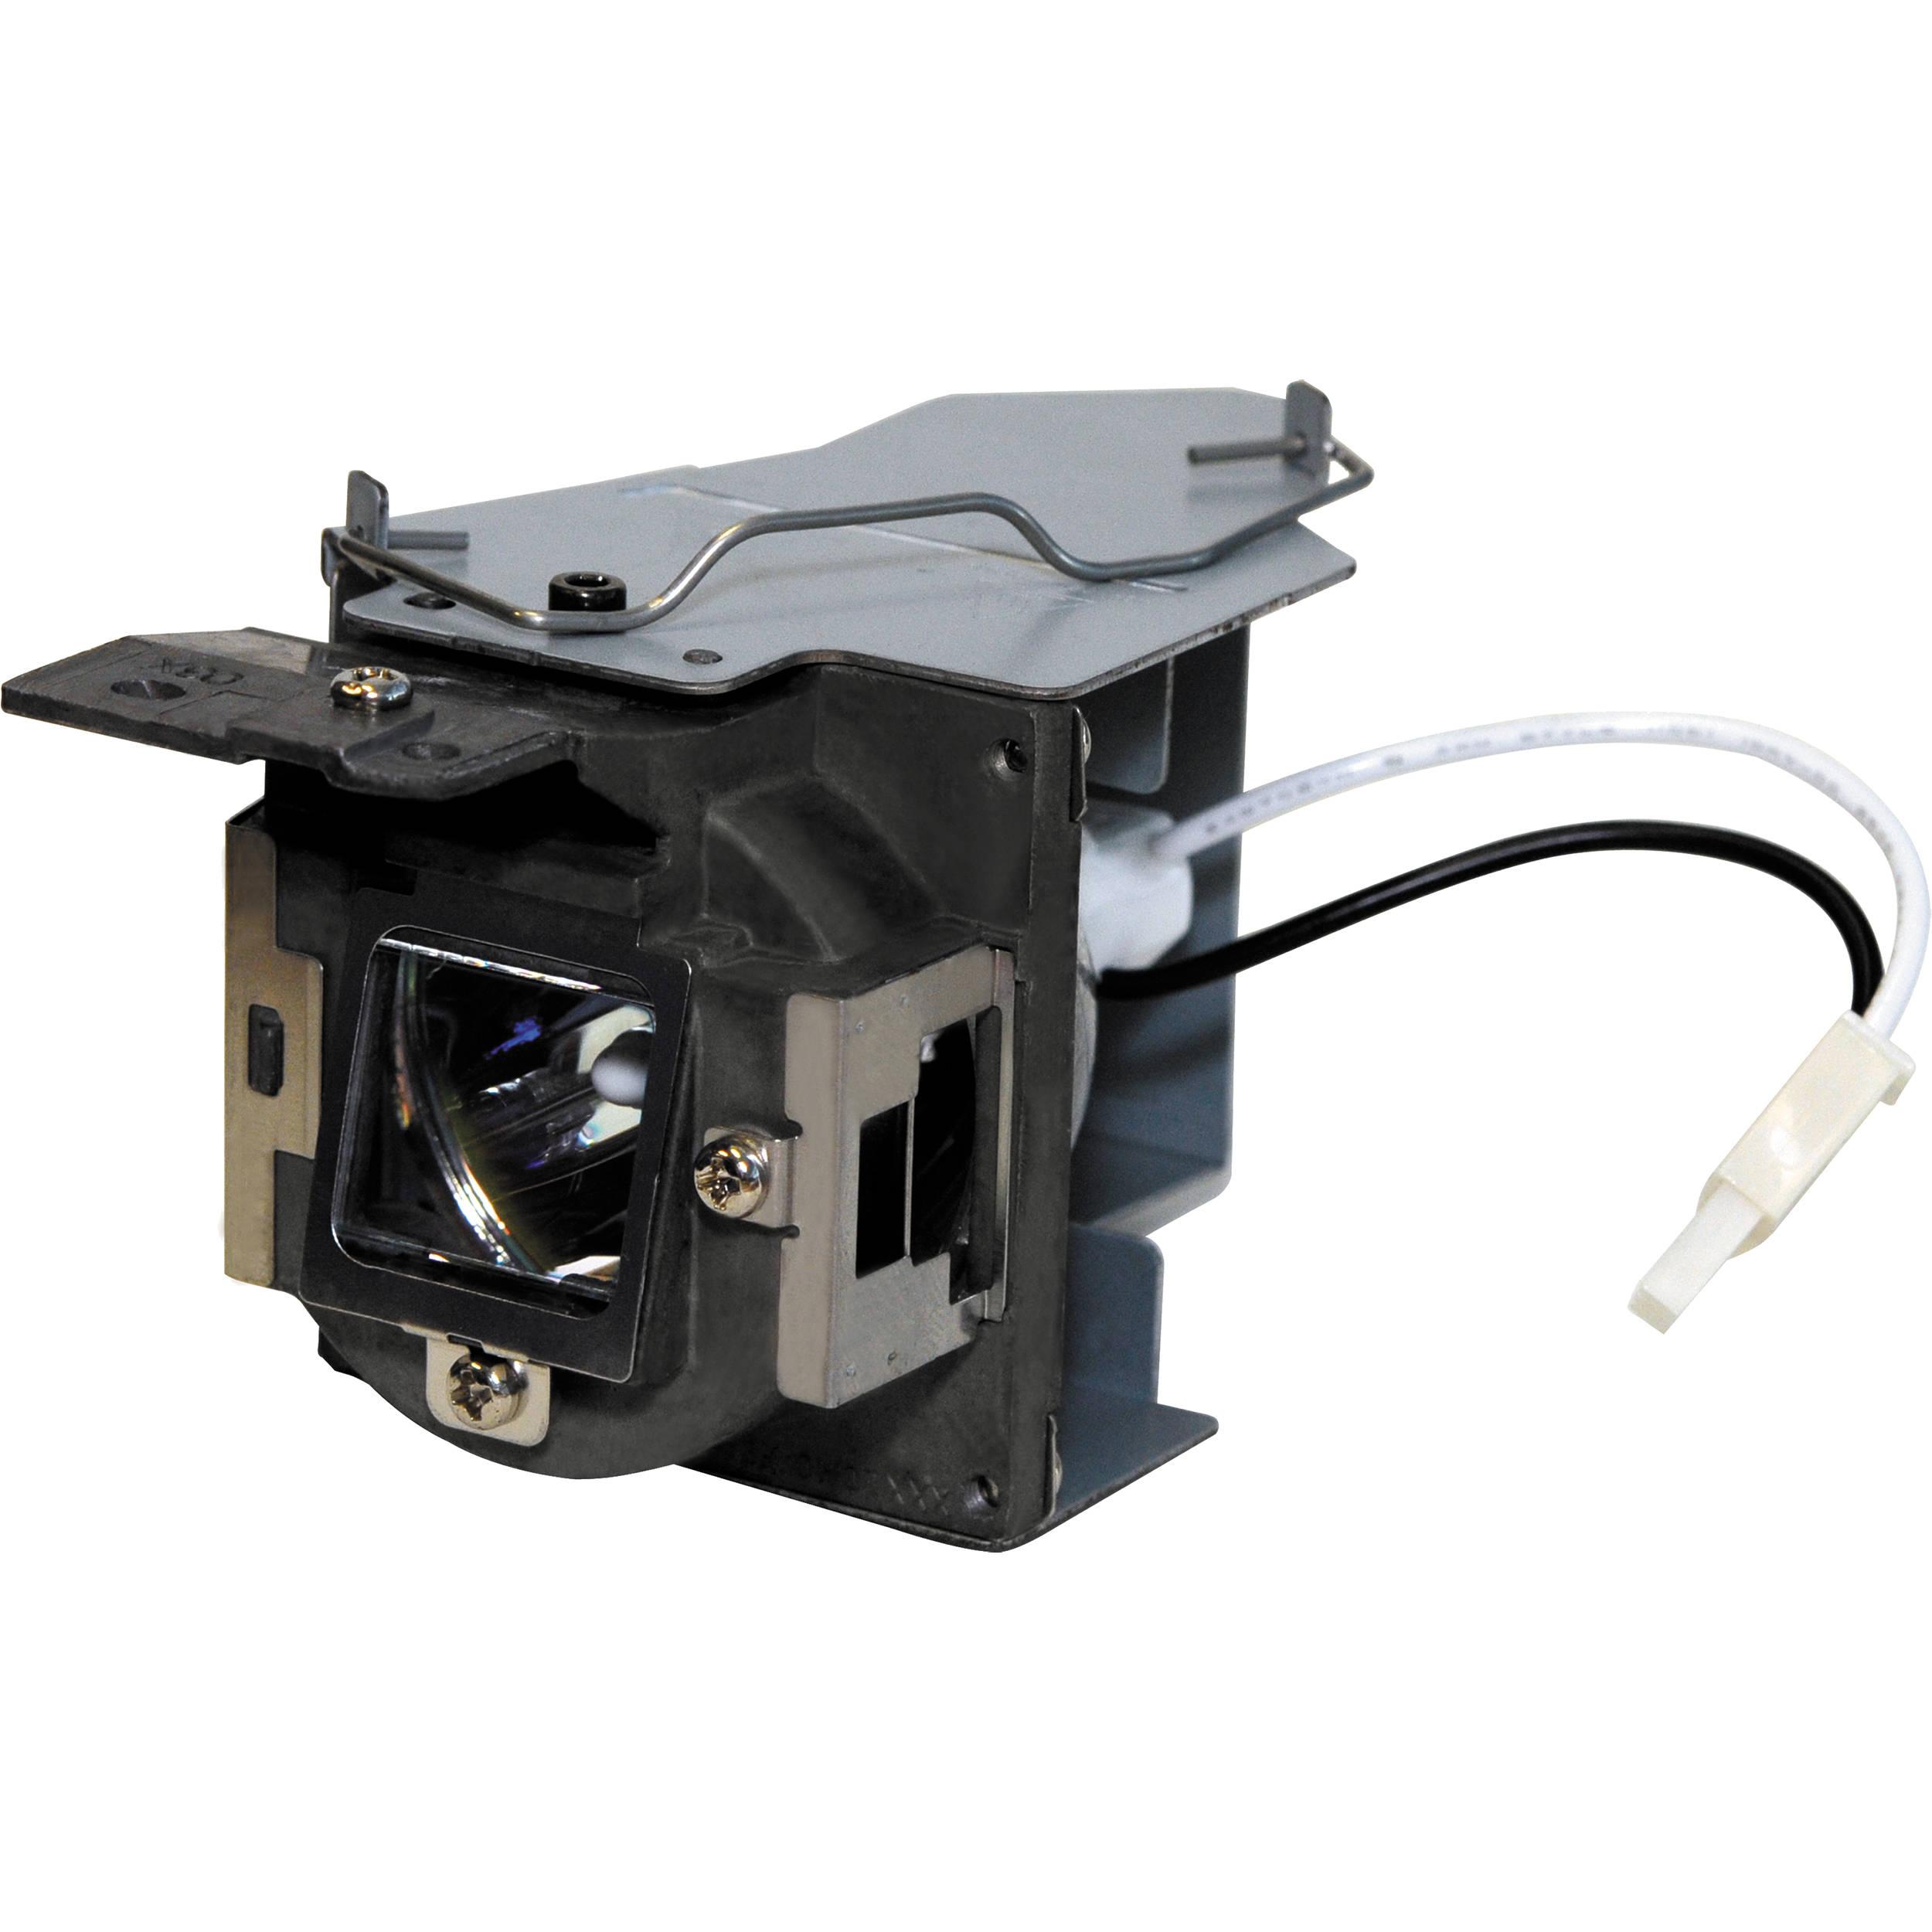 BenQ BenQ 5J.J5205.001 Replacement Lamp for MS500 5J.J5205.001